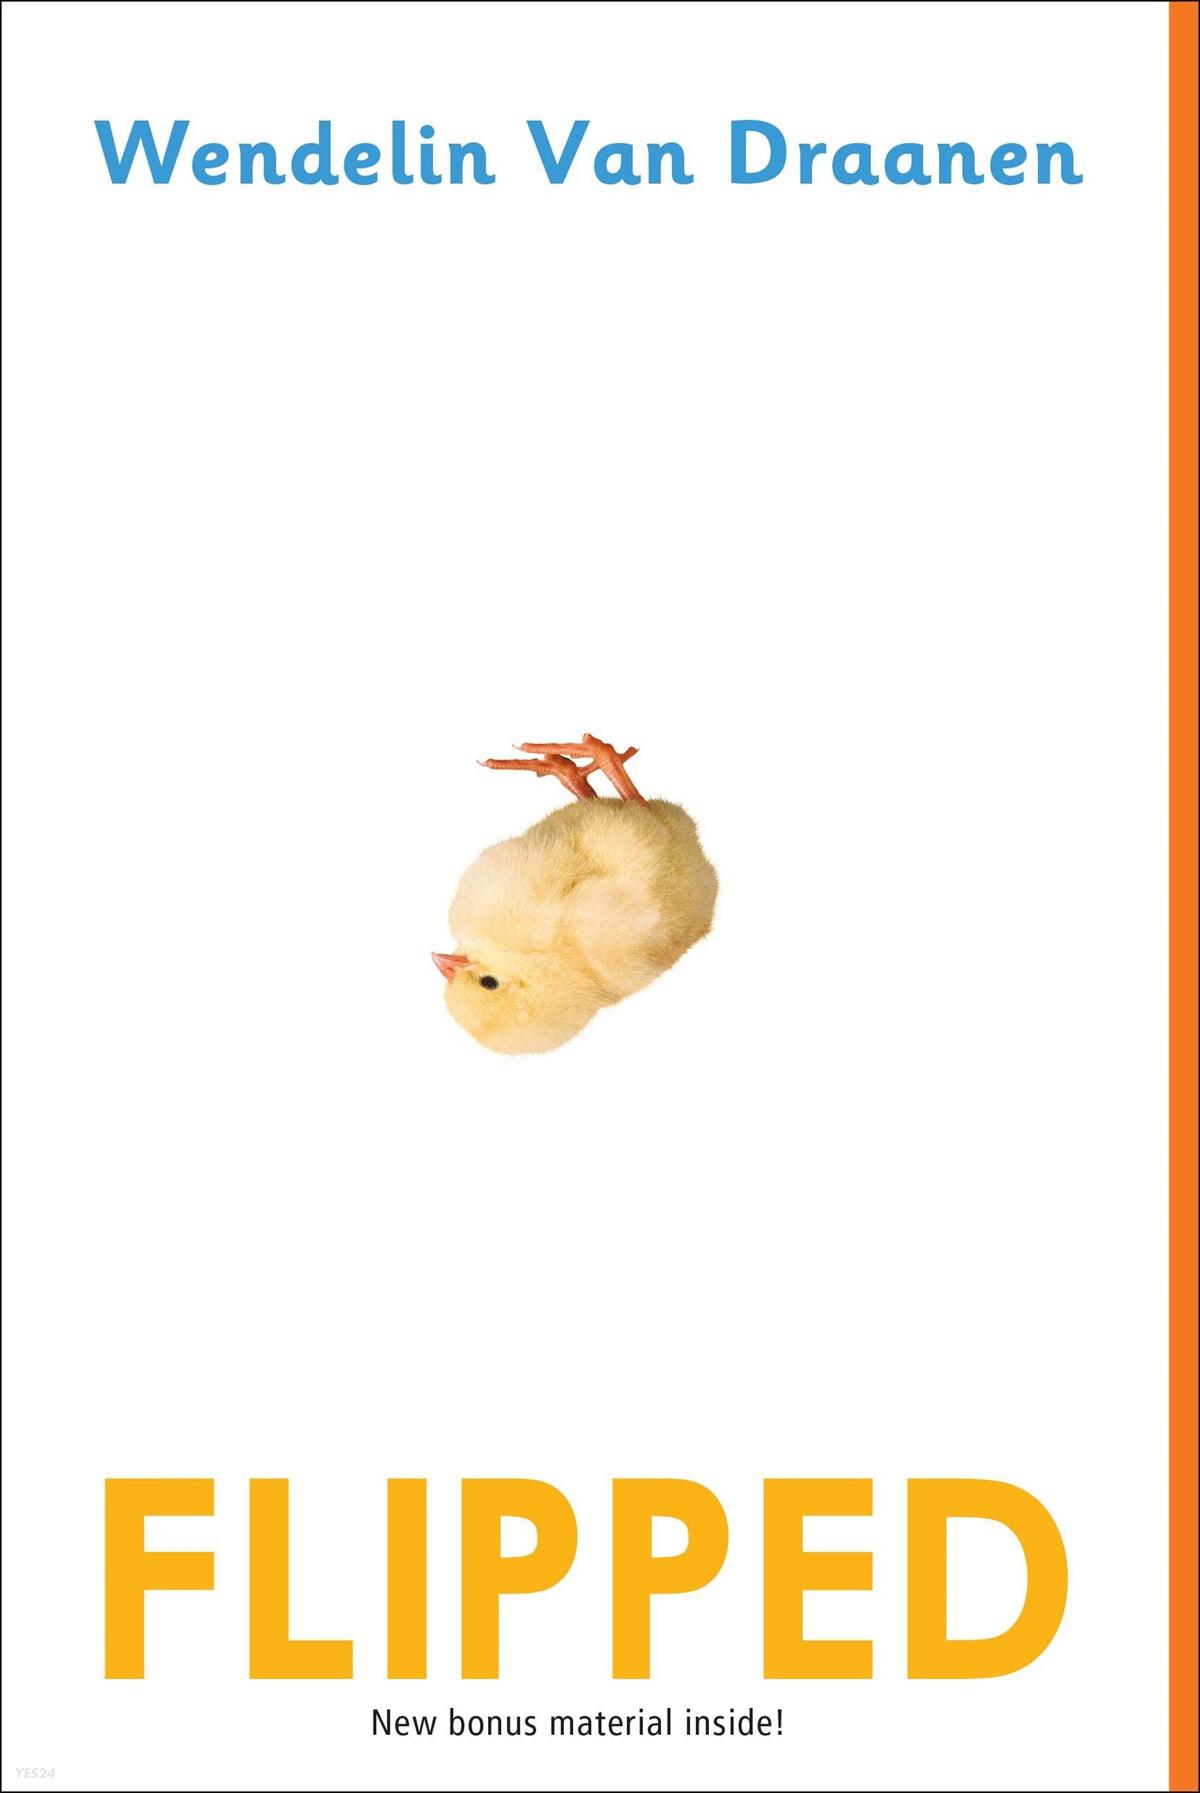 Flipped 영화 '플립' 원작 소설